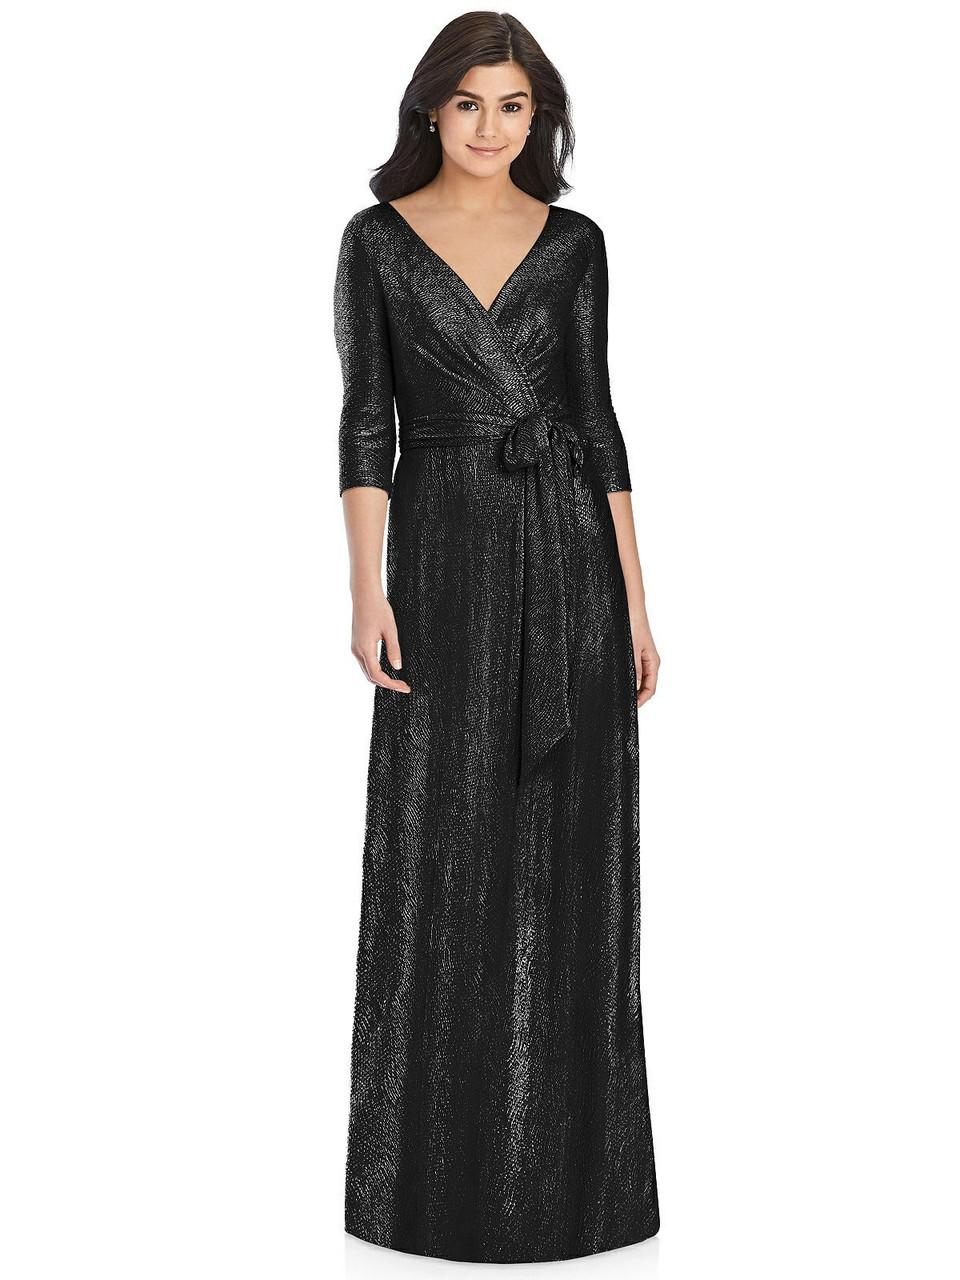 Dessy Collection Bridesmaid Dress 3028 - Soho Metallic